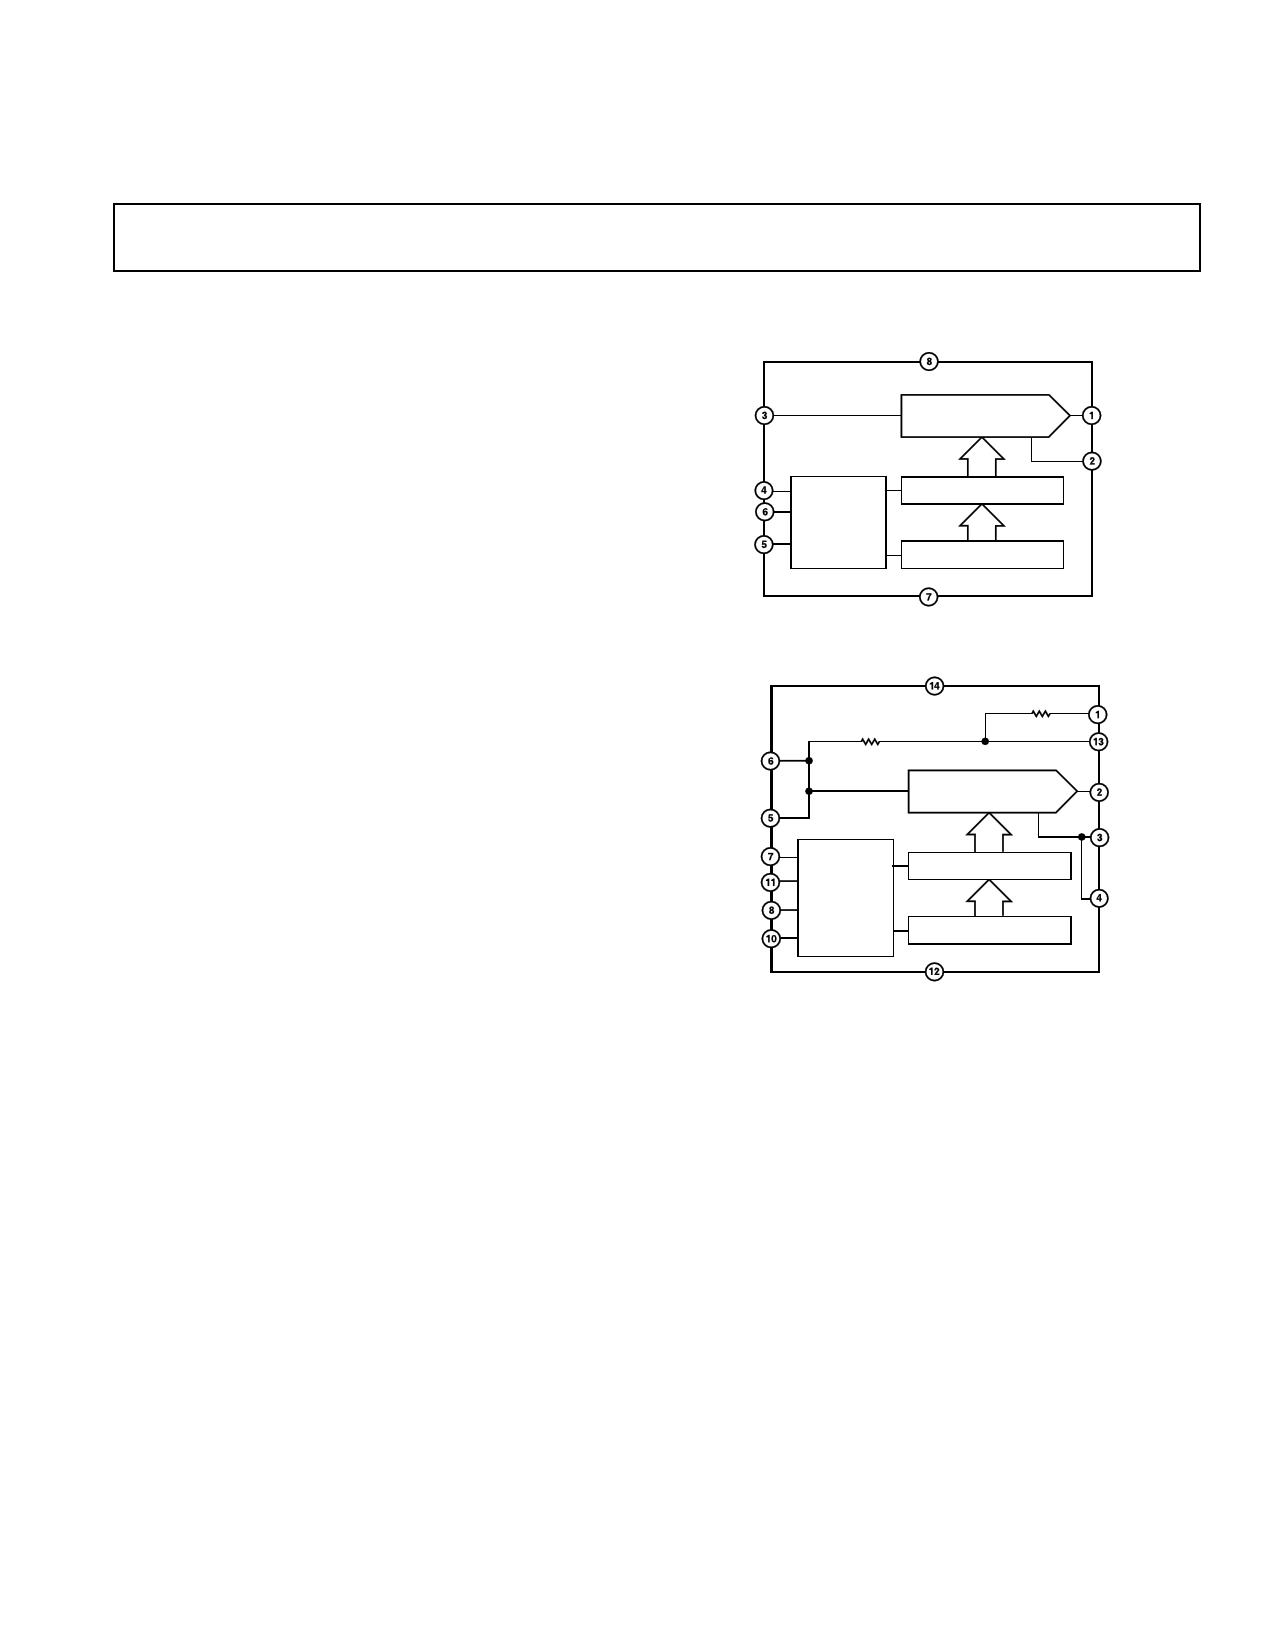 AD5552 datasheet